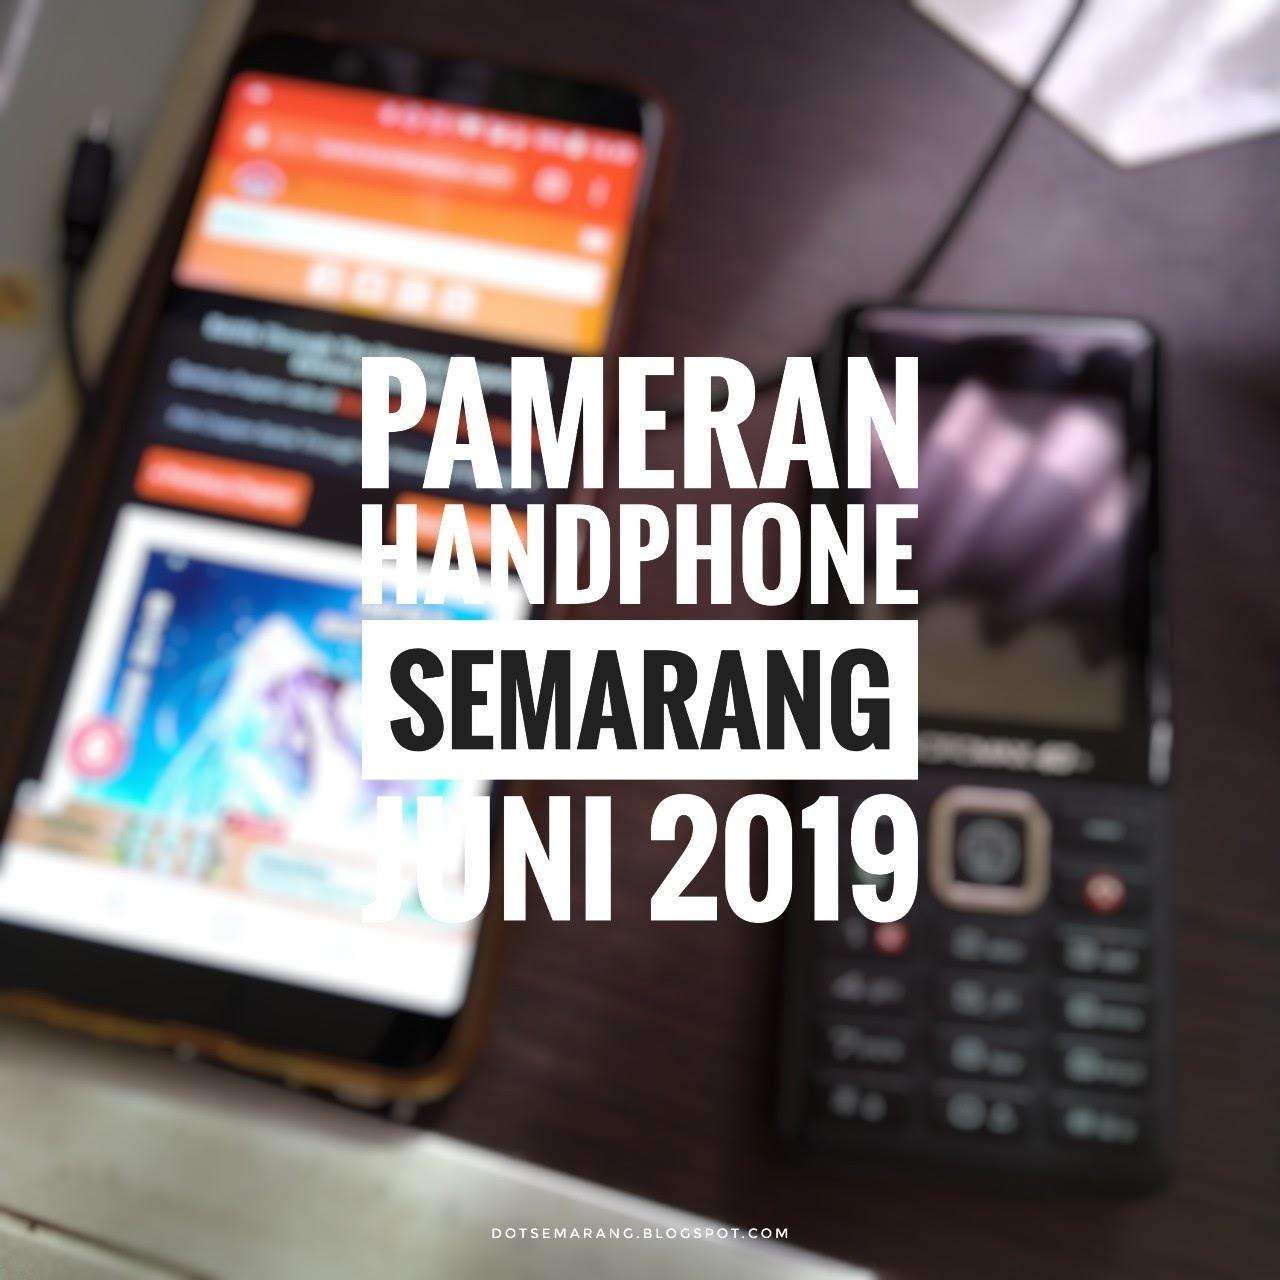 Jadwal Pameran Handphone di Semarang Bulan Juni 2019